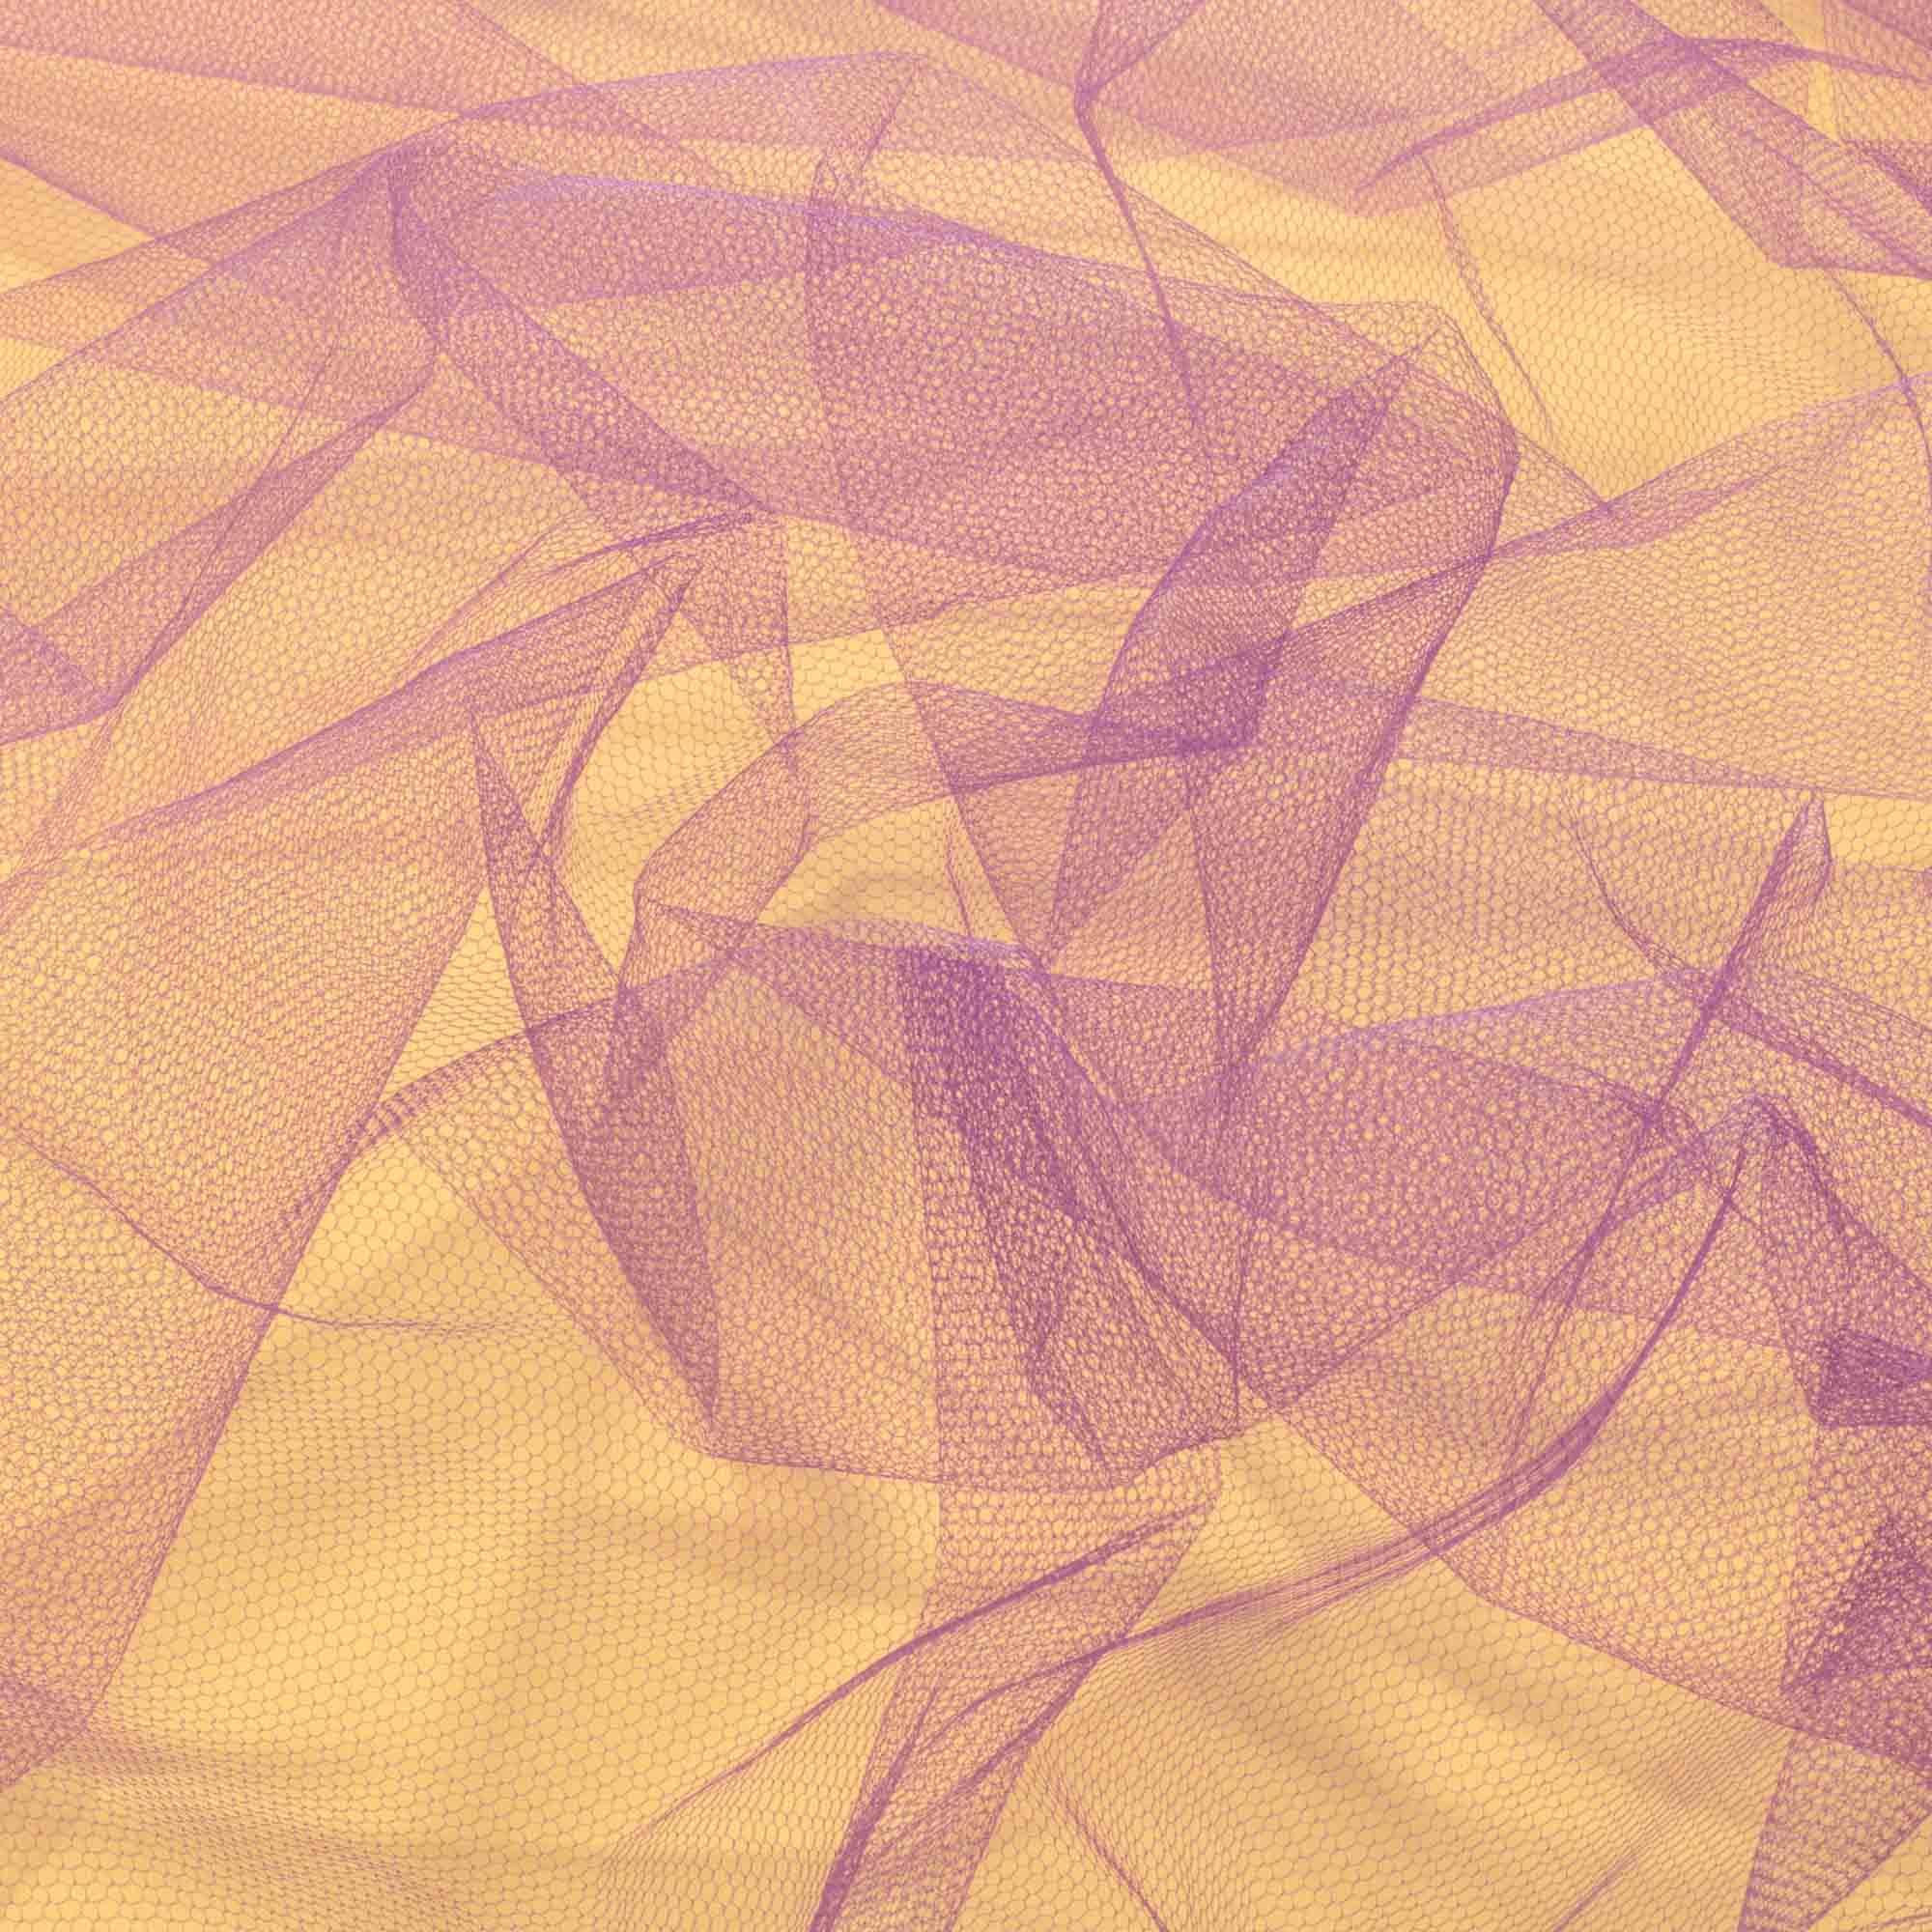 Tecido Tule 100% Poliester 1,20 Mt Largura 059 Violeta